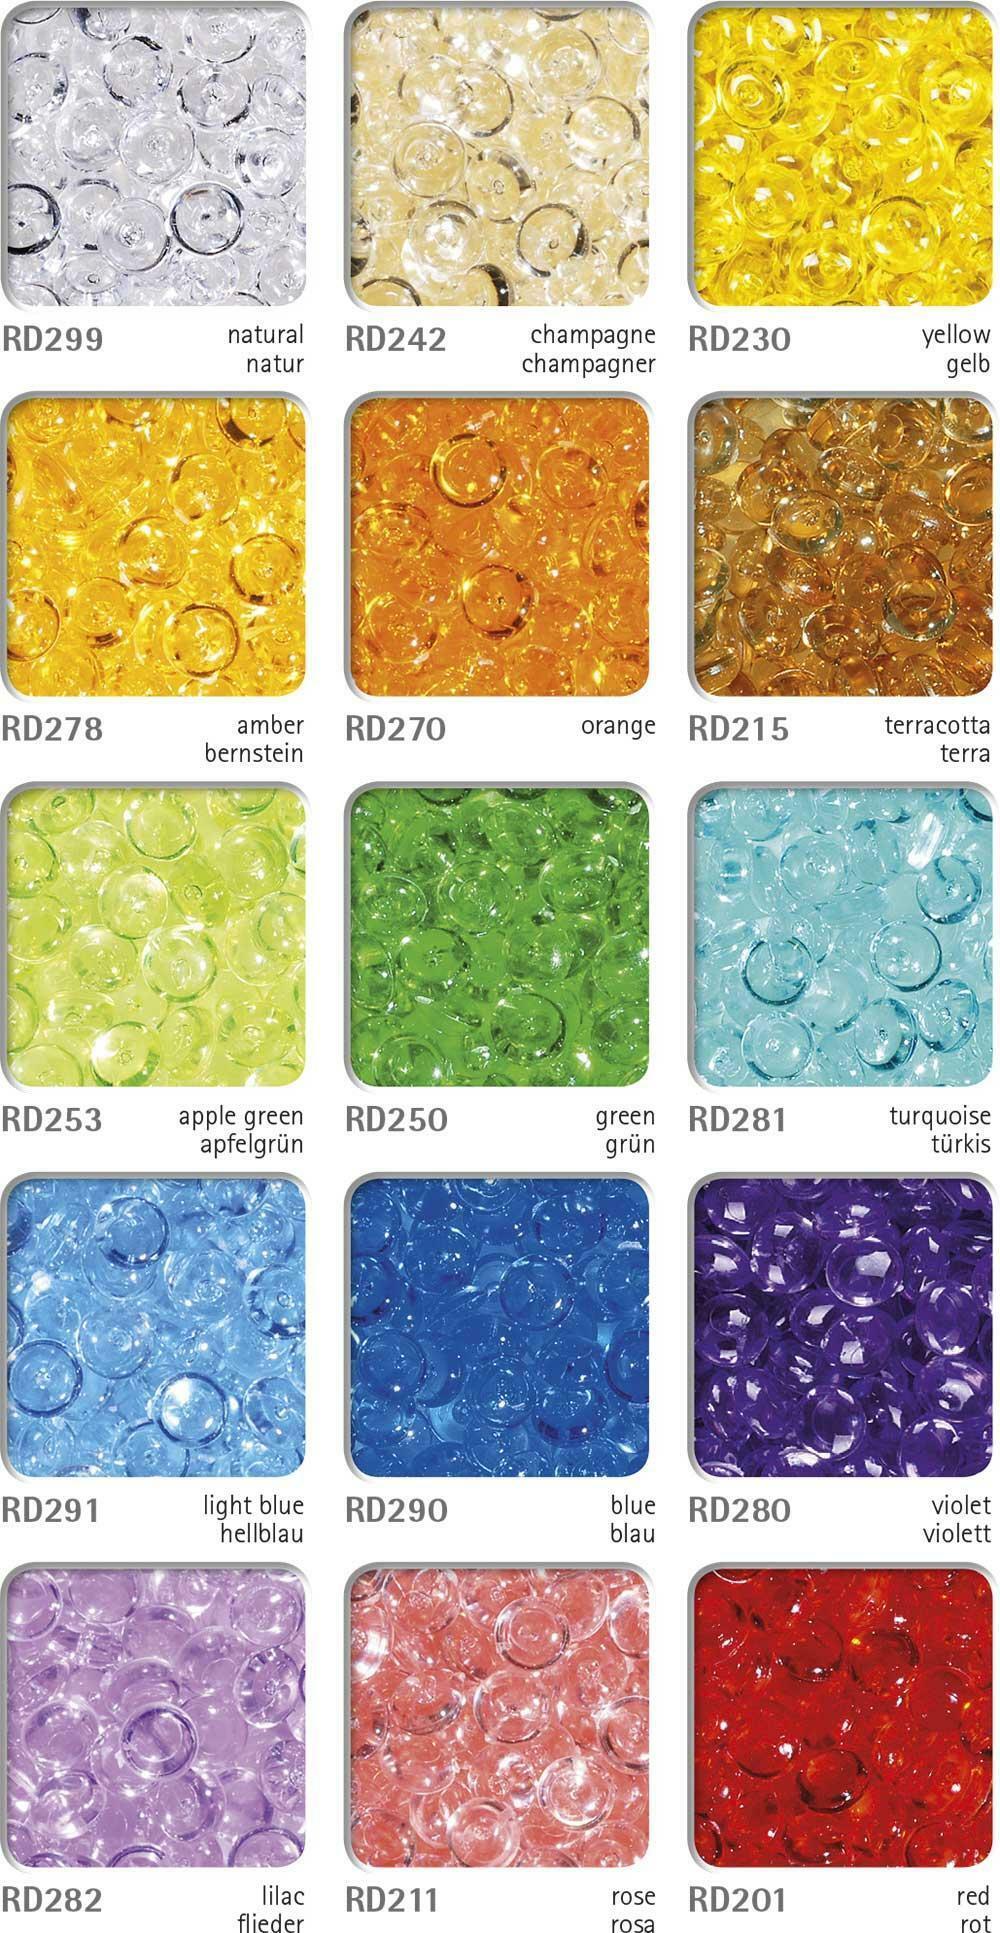 eurosand gocce di pioggia 2-4 mm in pvc ambra - 333 ml